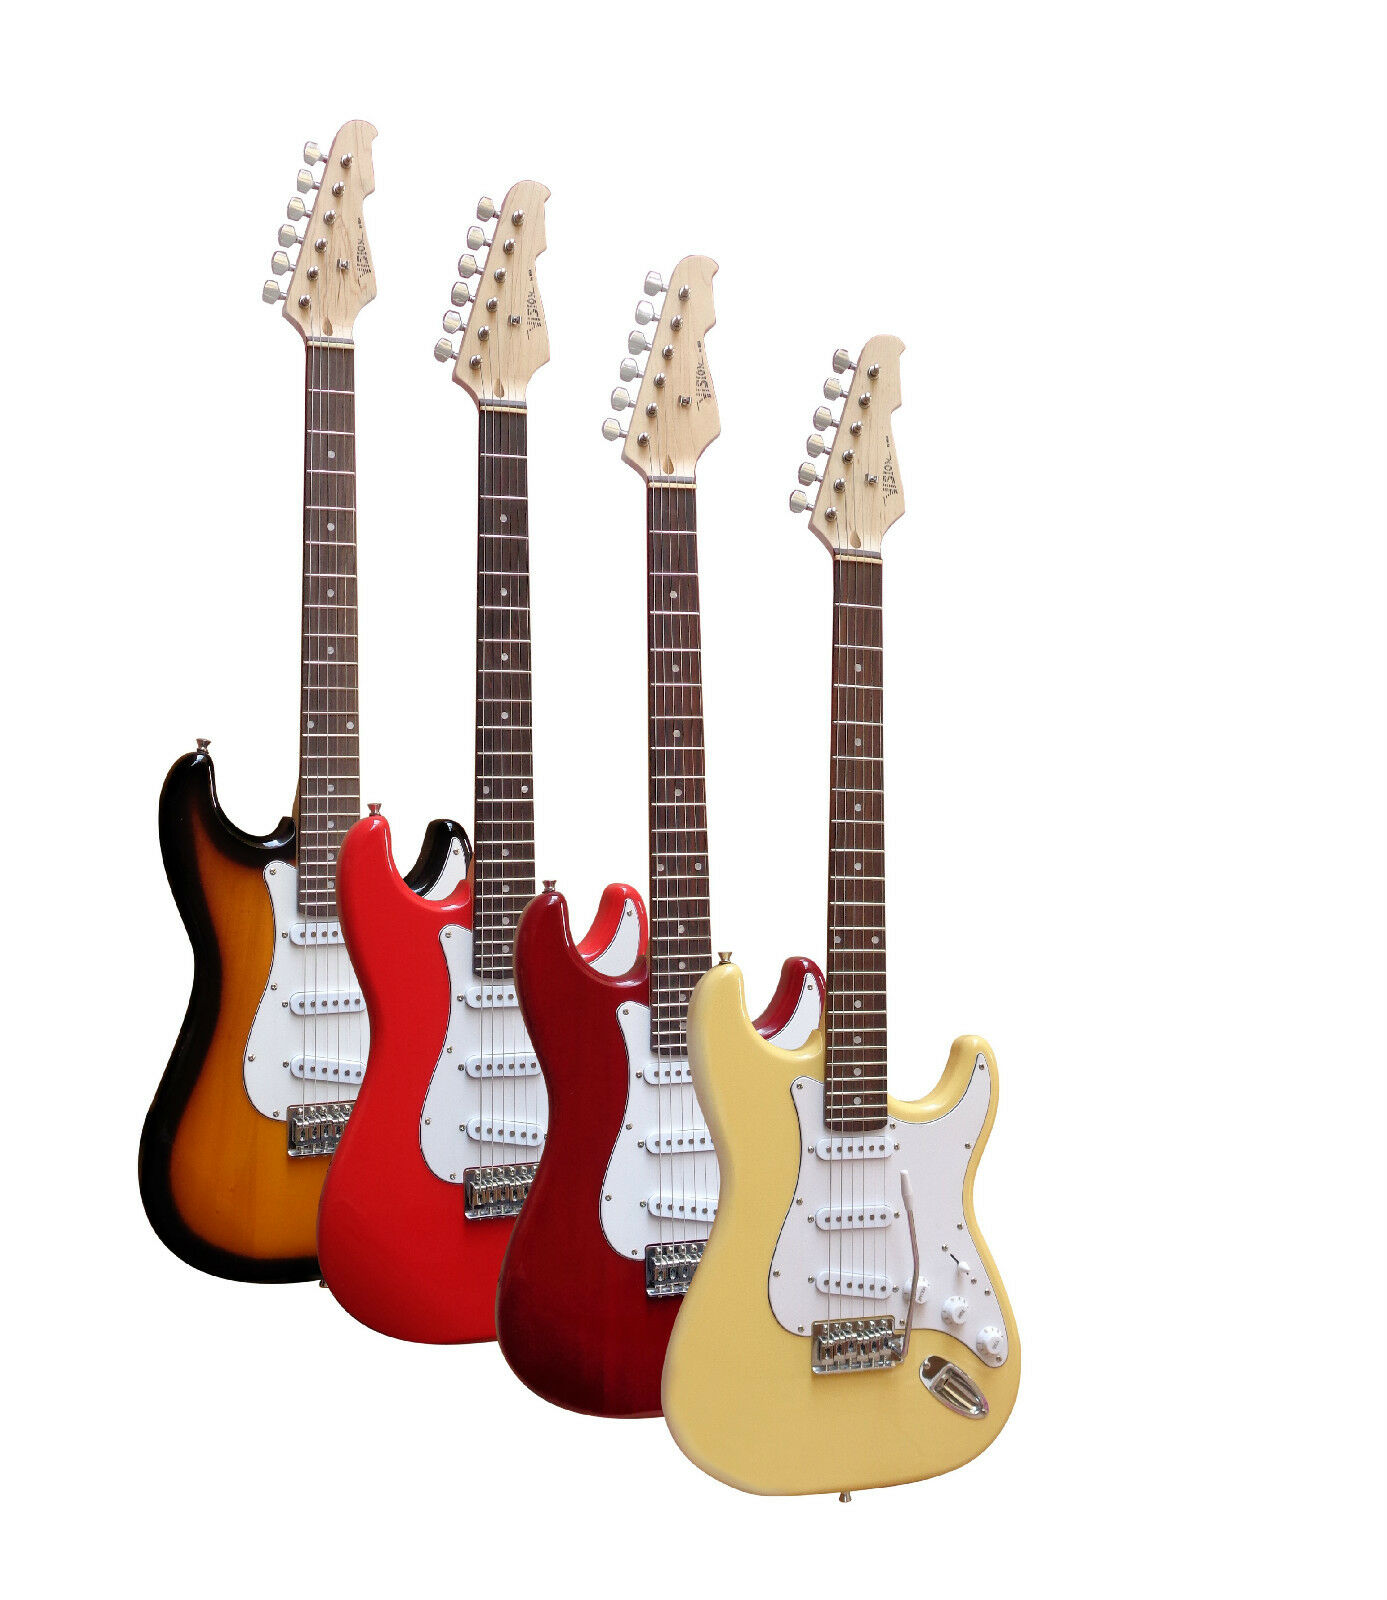 E-Gitarre - Tolle Farbauswahl - Individuell - Massivholzkörper - Elektrogitarre